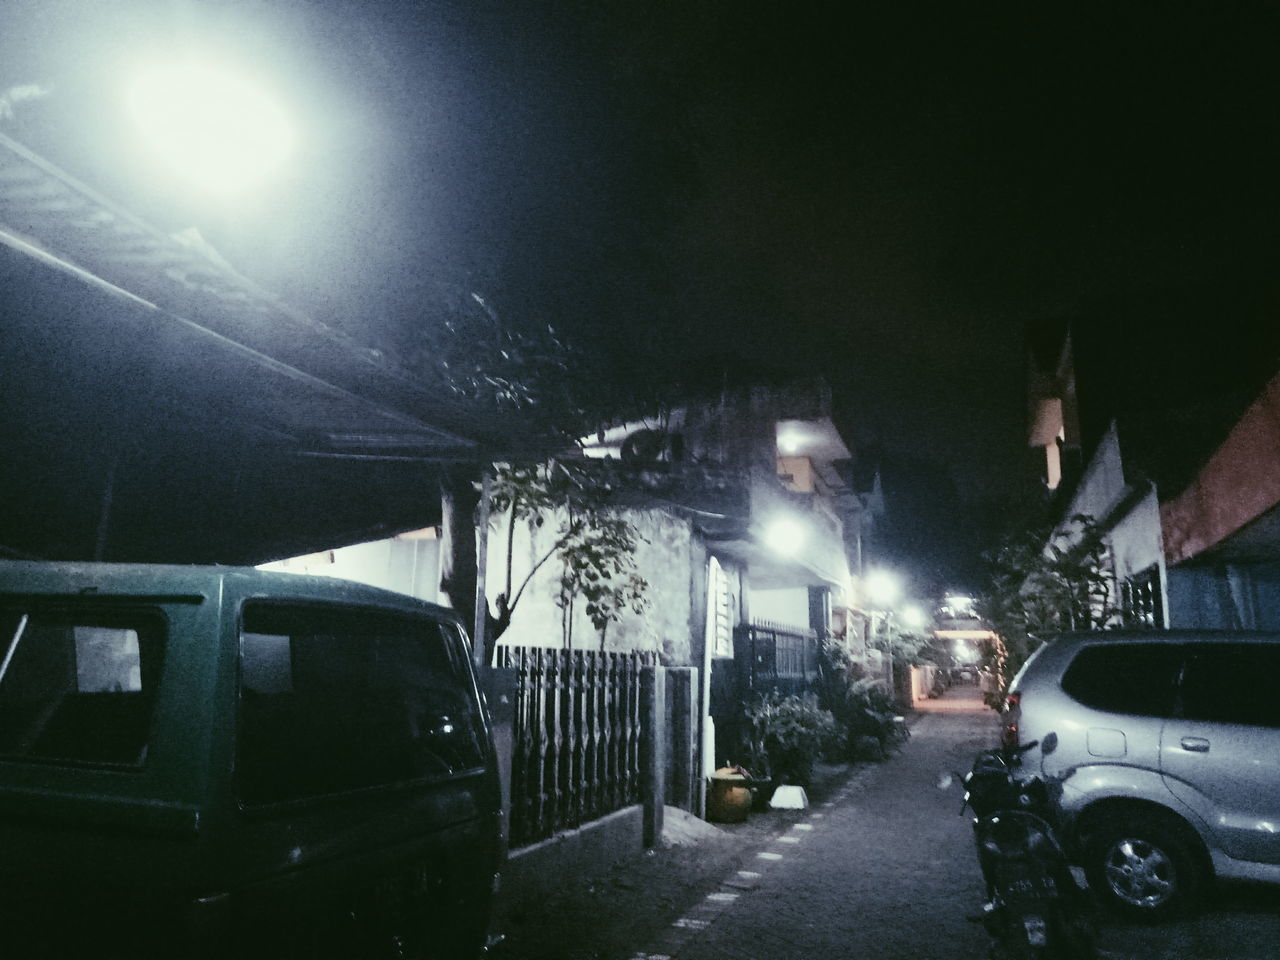 car, night, illuminated, transportation, land vehicle, mode of transport, stationary, no people, outdoors, architecture